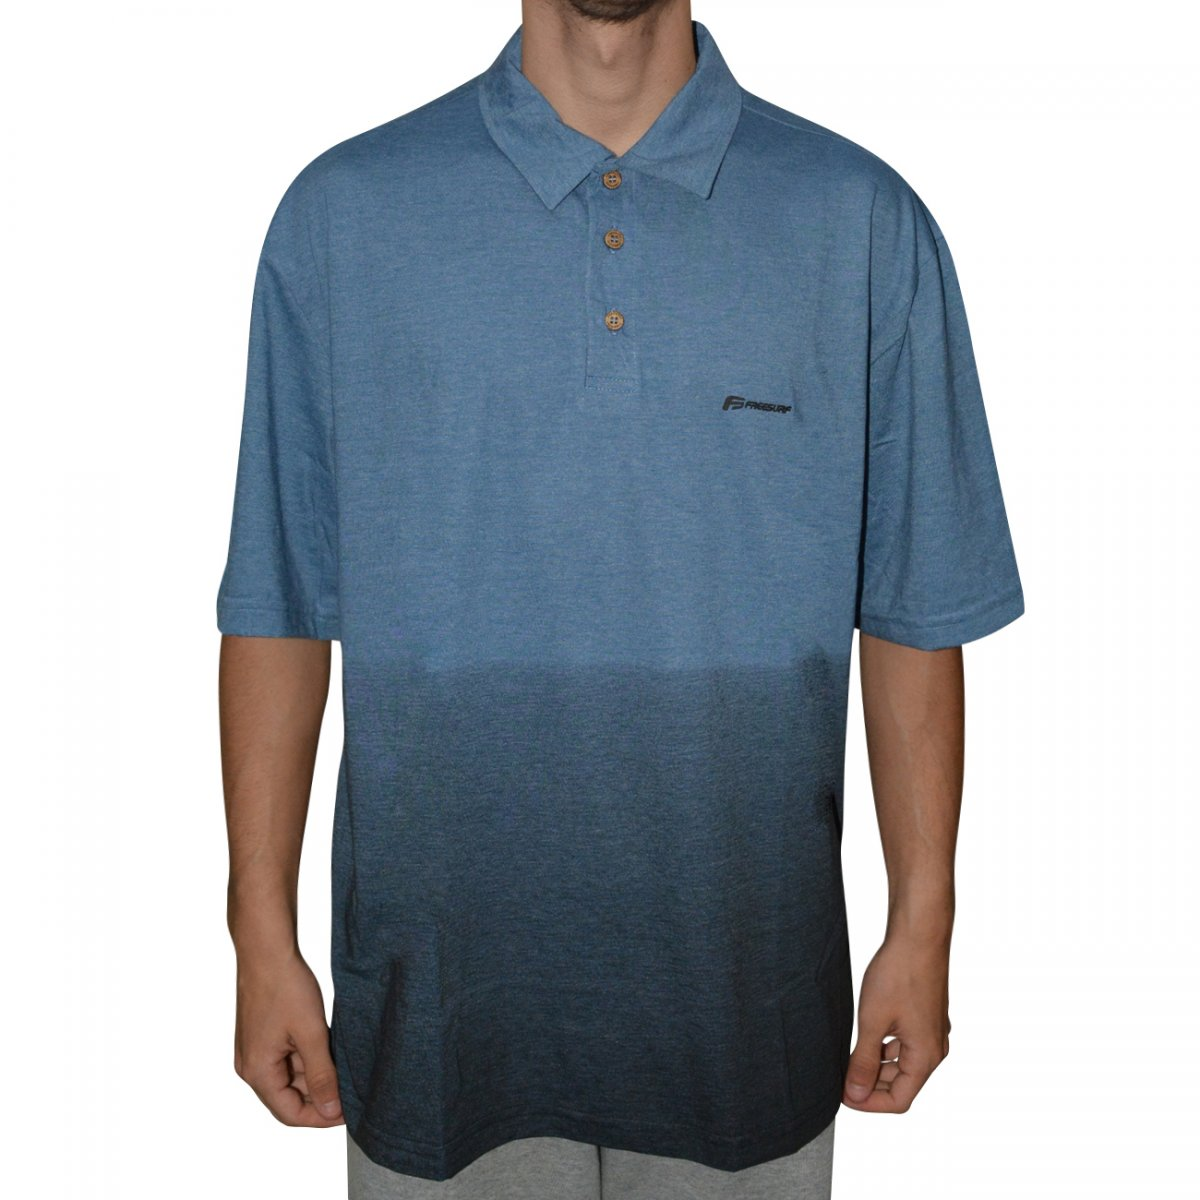 Camisa Polo Free Surf Ocean Big Size 110502388 - Azul mescla - Chuteira  Nike 04fe6990ed40b